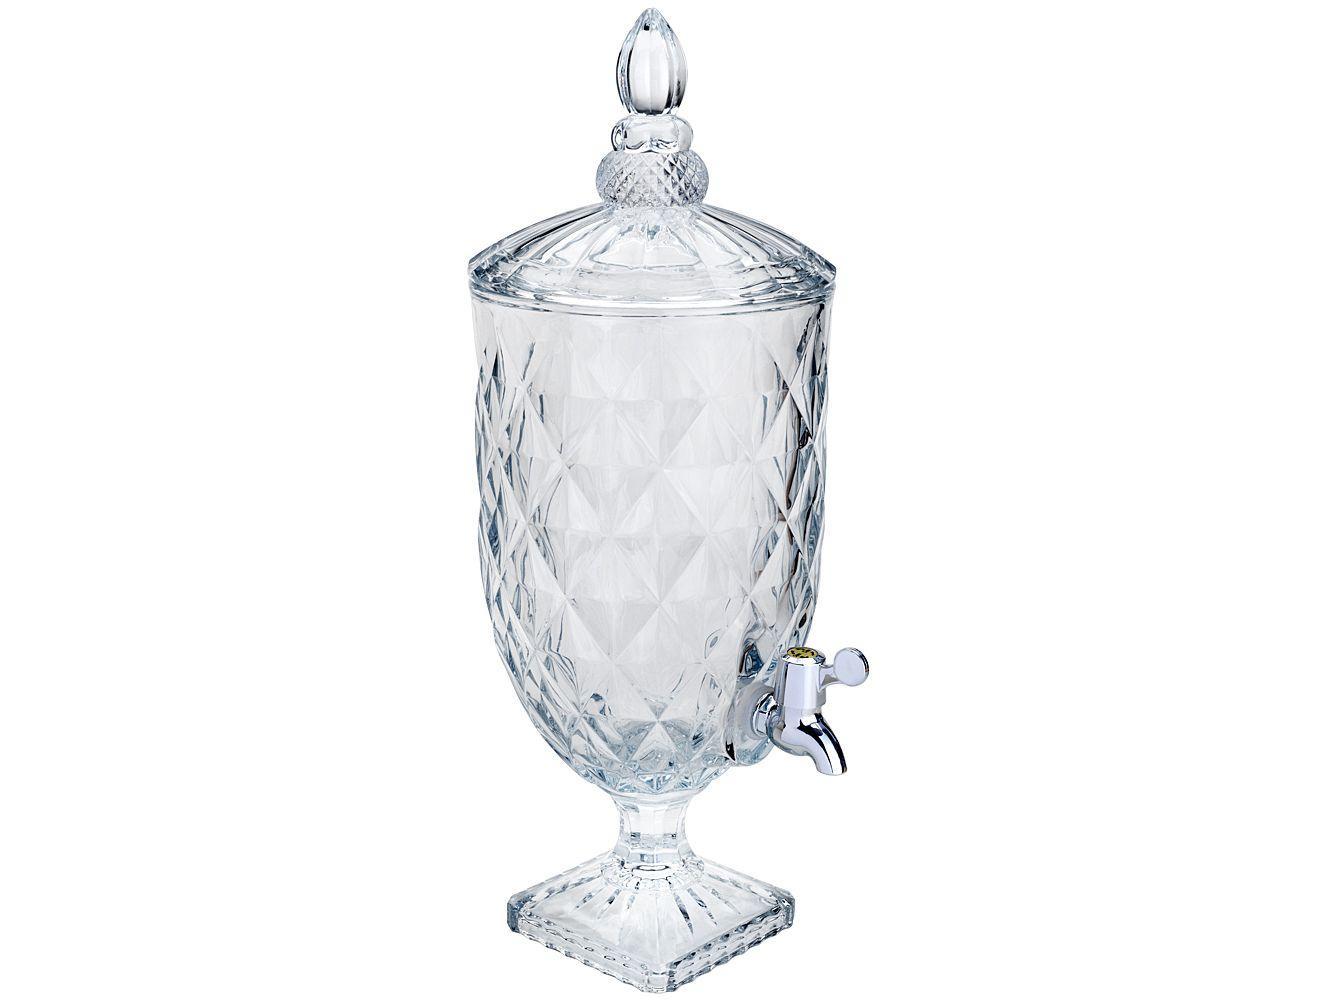 Suqueira 5L Lyor - Diamond